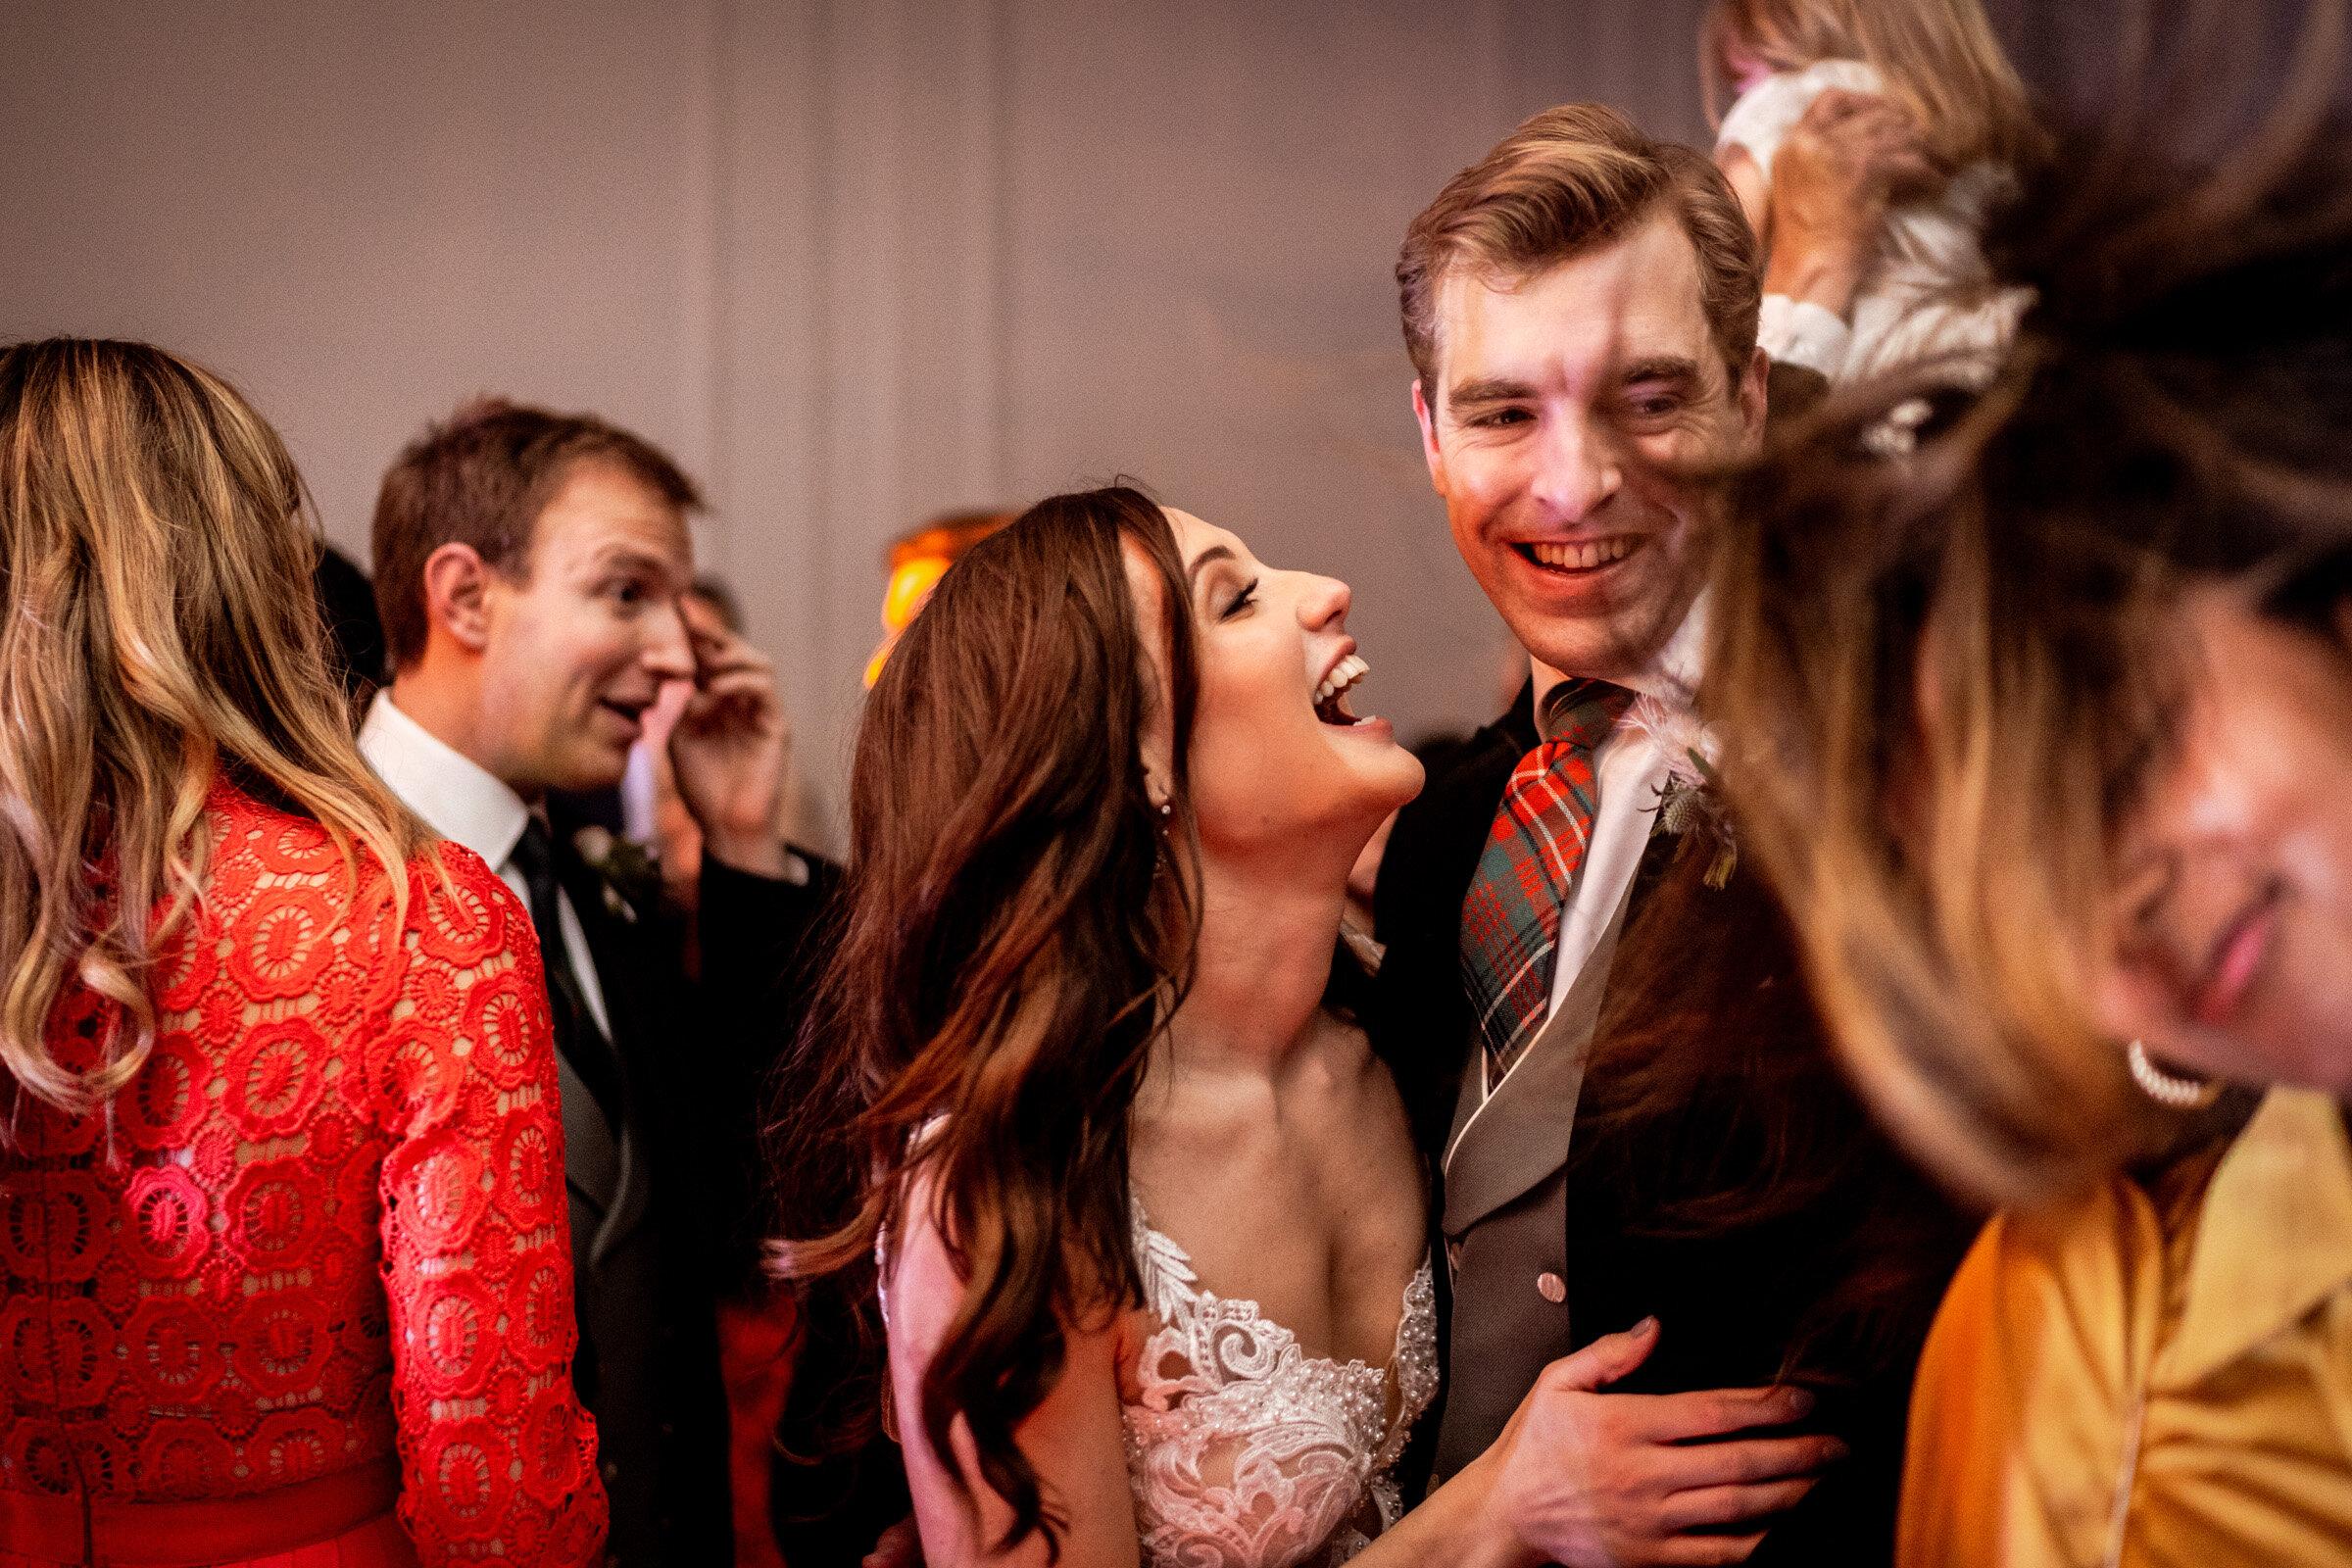 拉姆斯菲尔德的新娘……——16:28号